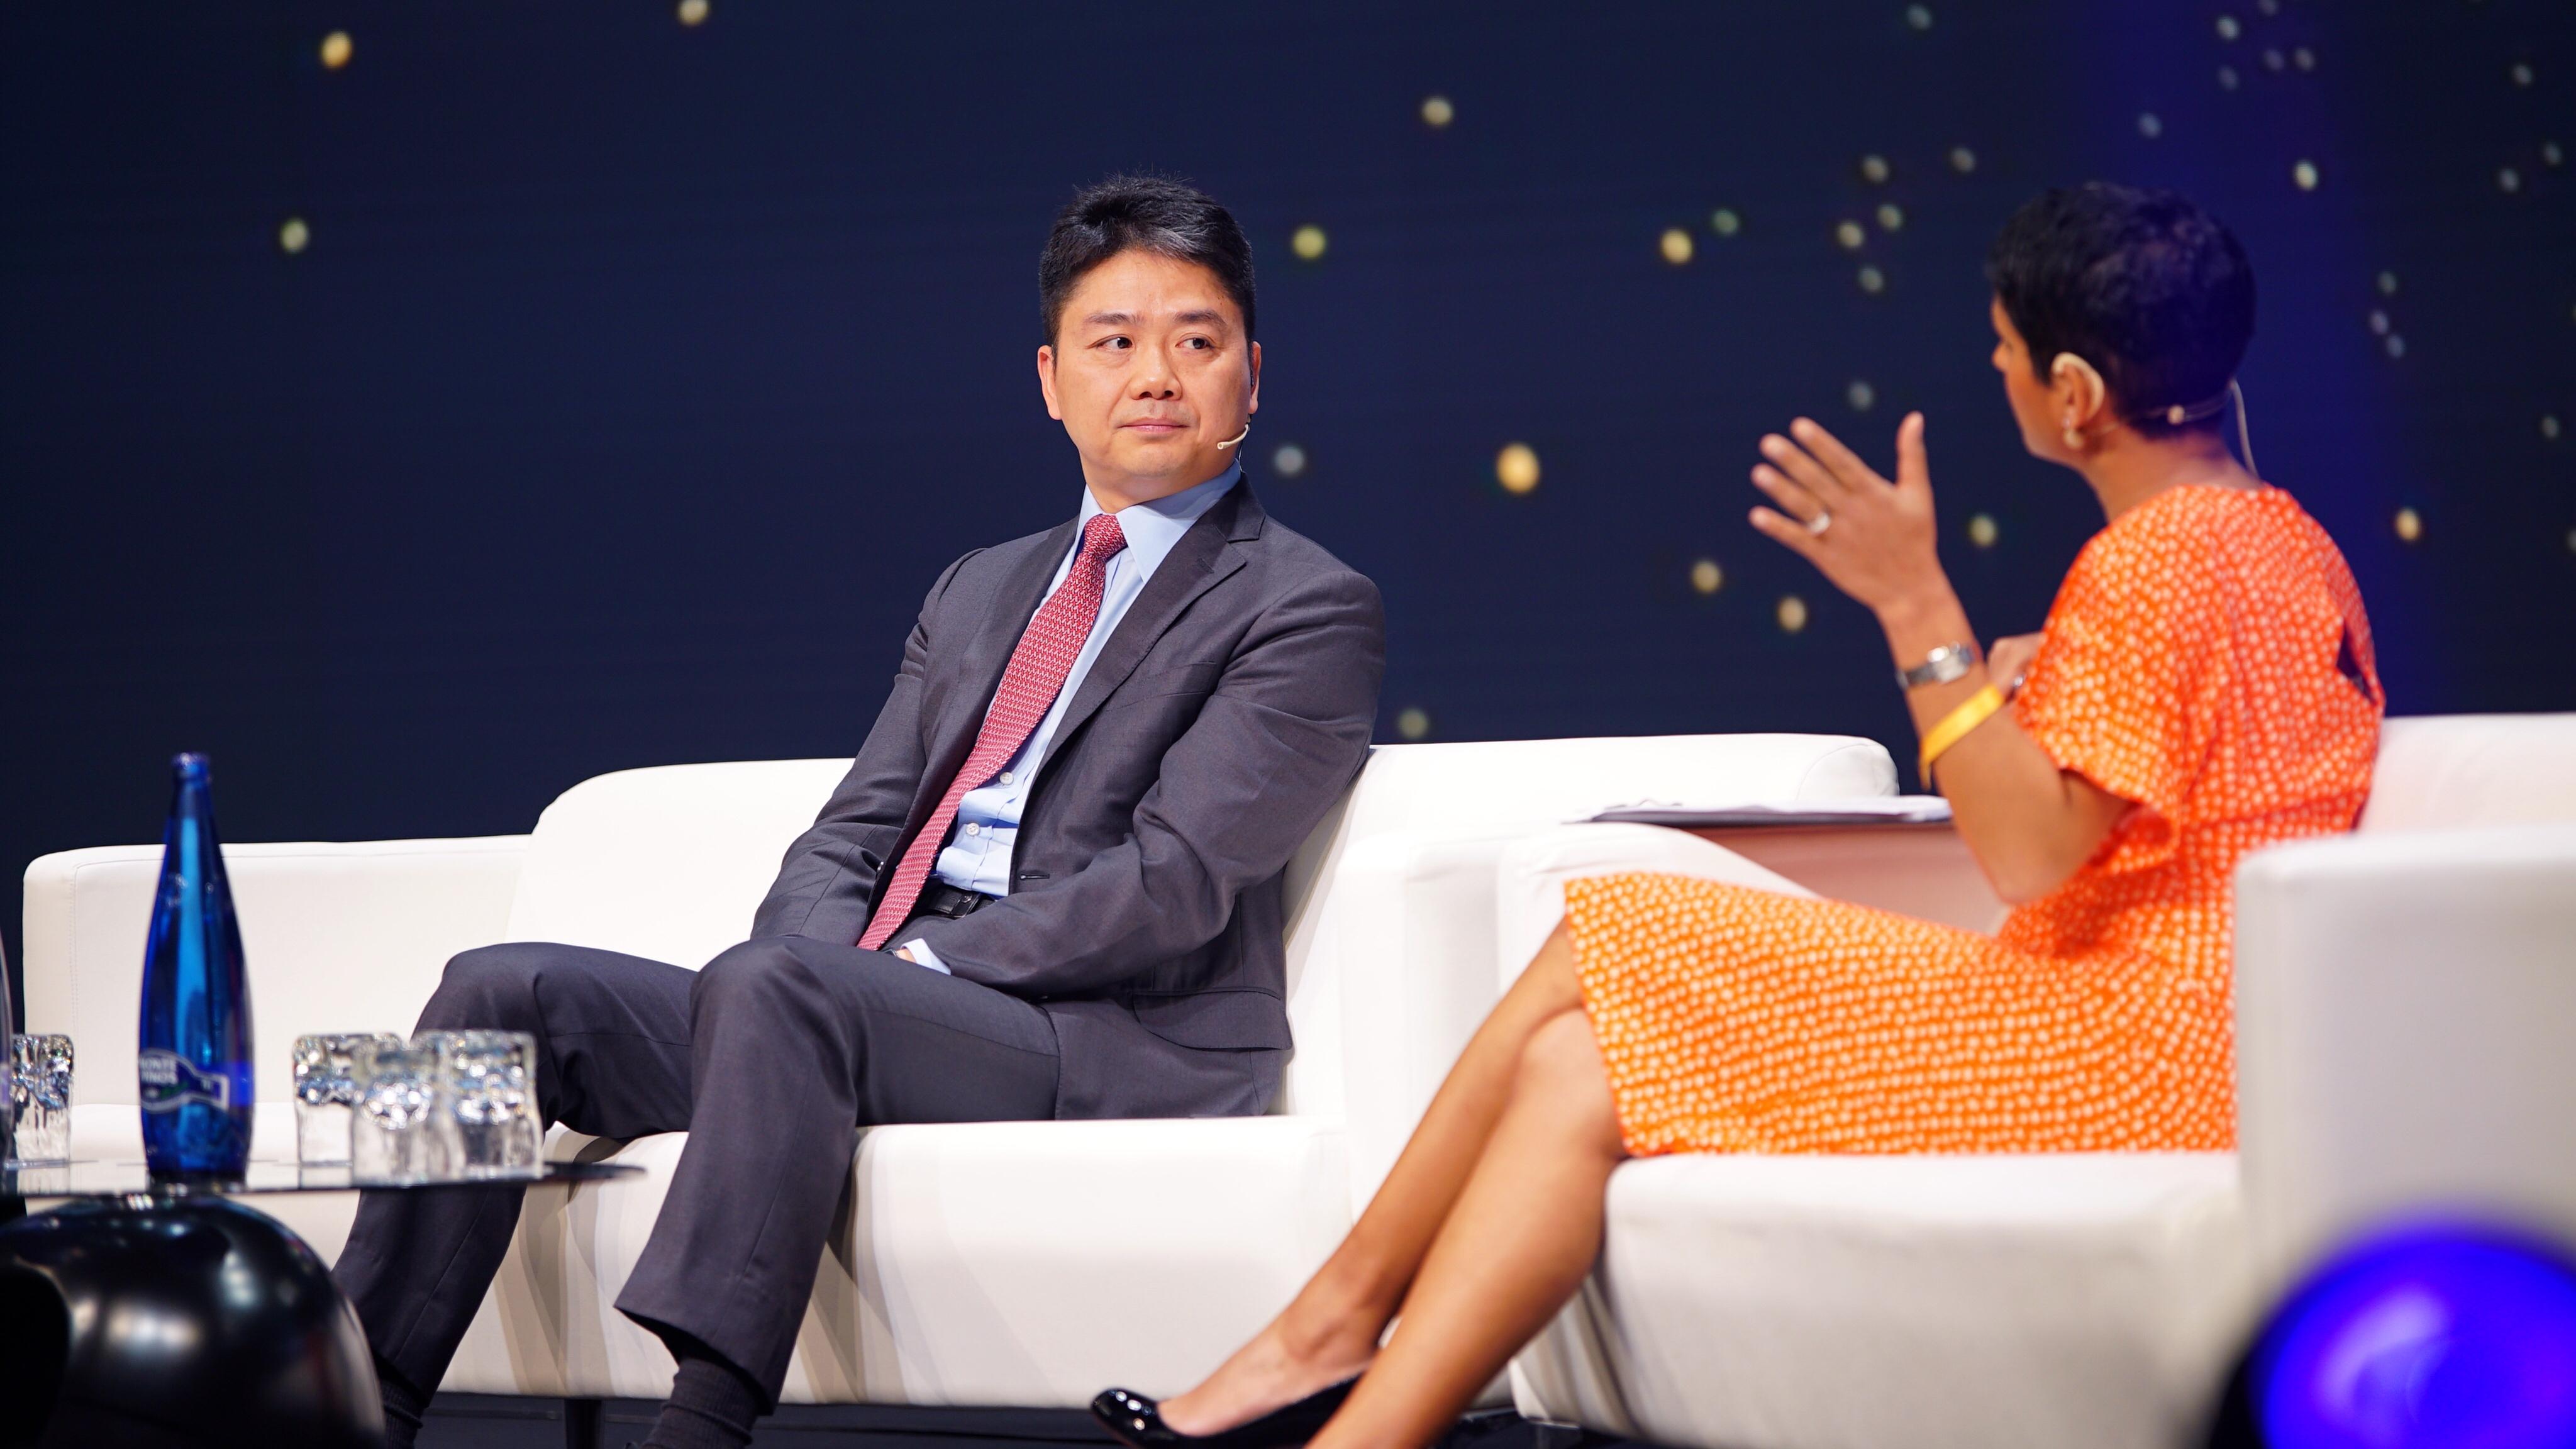 JD.com CEO Richard Liu at World Retail Congress in Madrid.